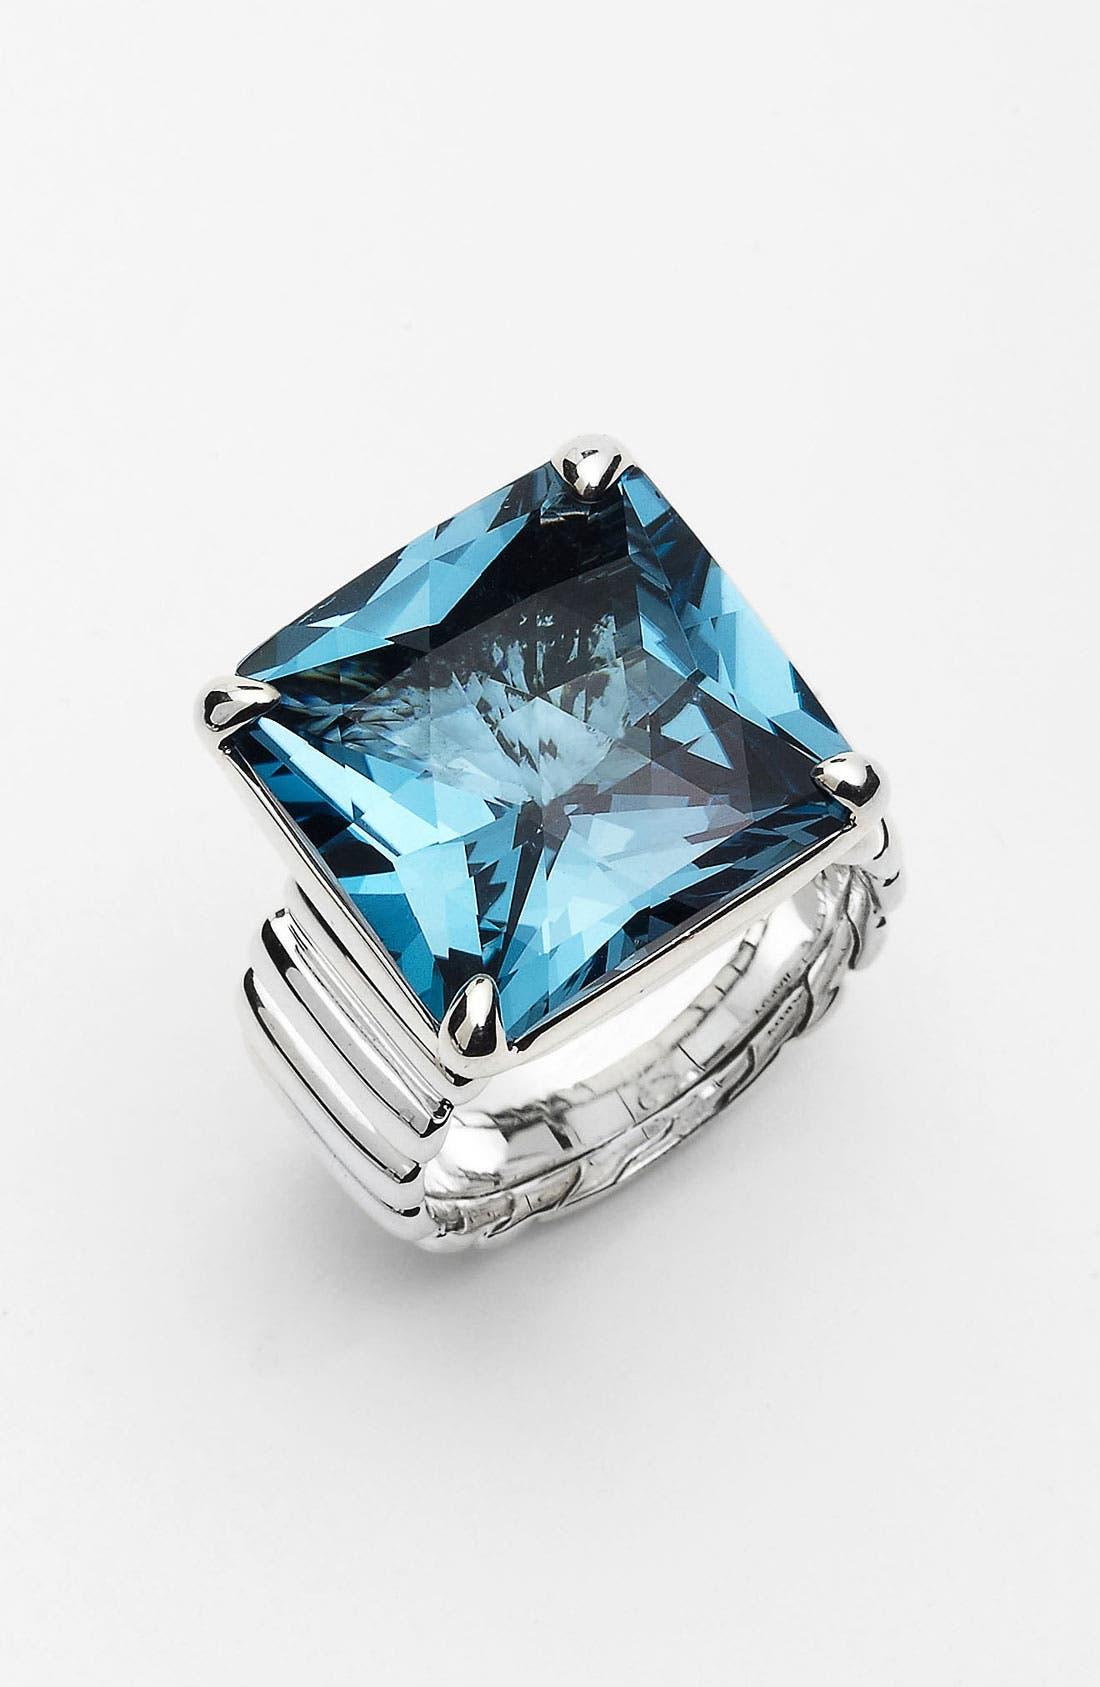 Alternate Image 1 Selected - John Hardy 'Bedeg' Large Square Ring